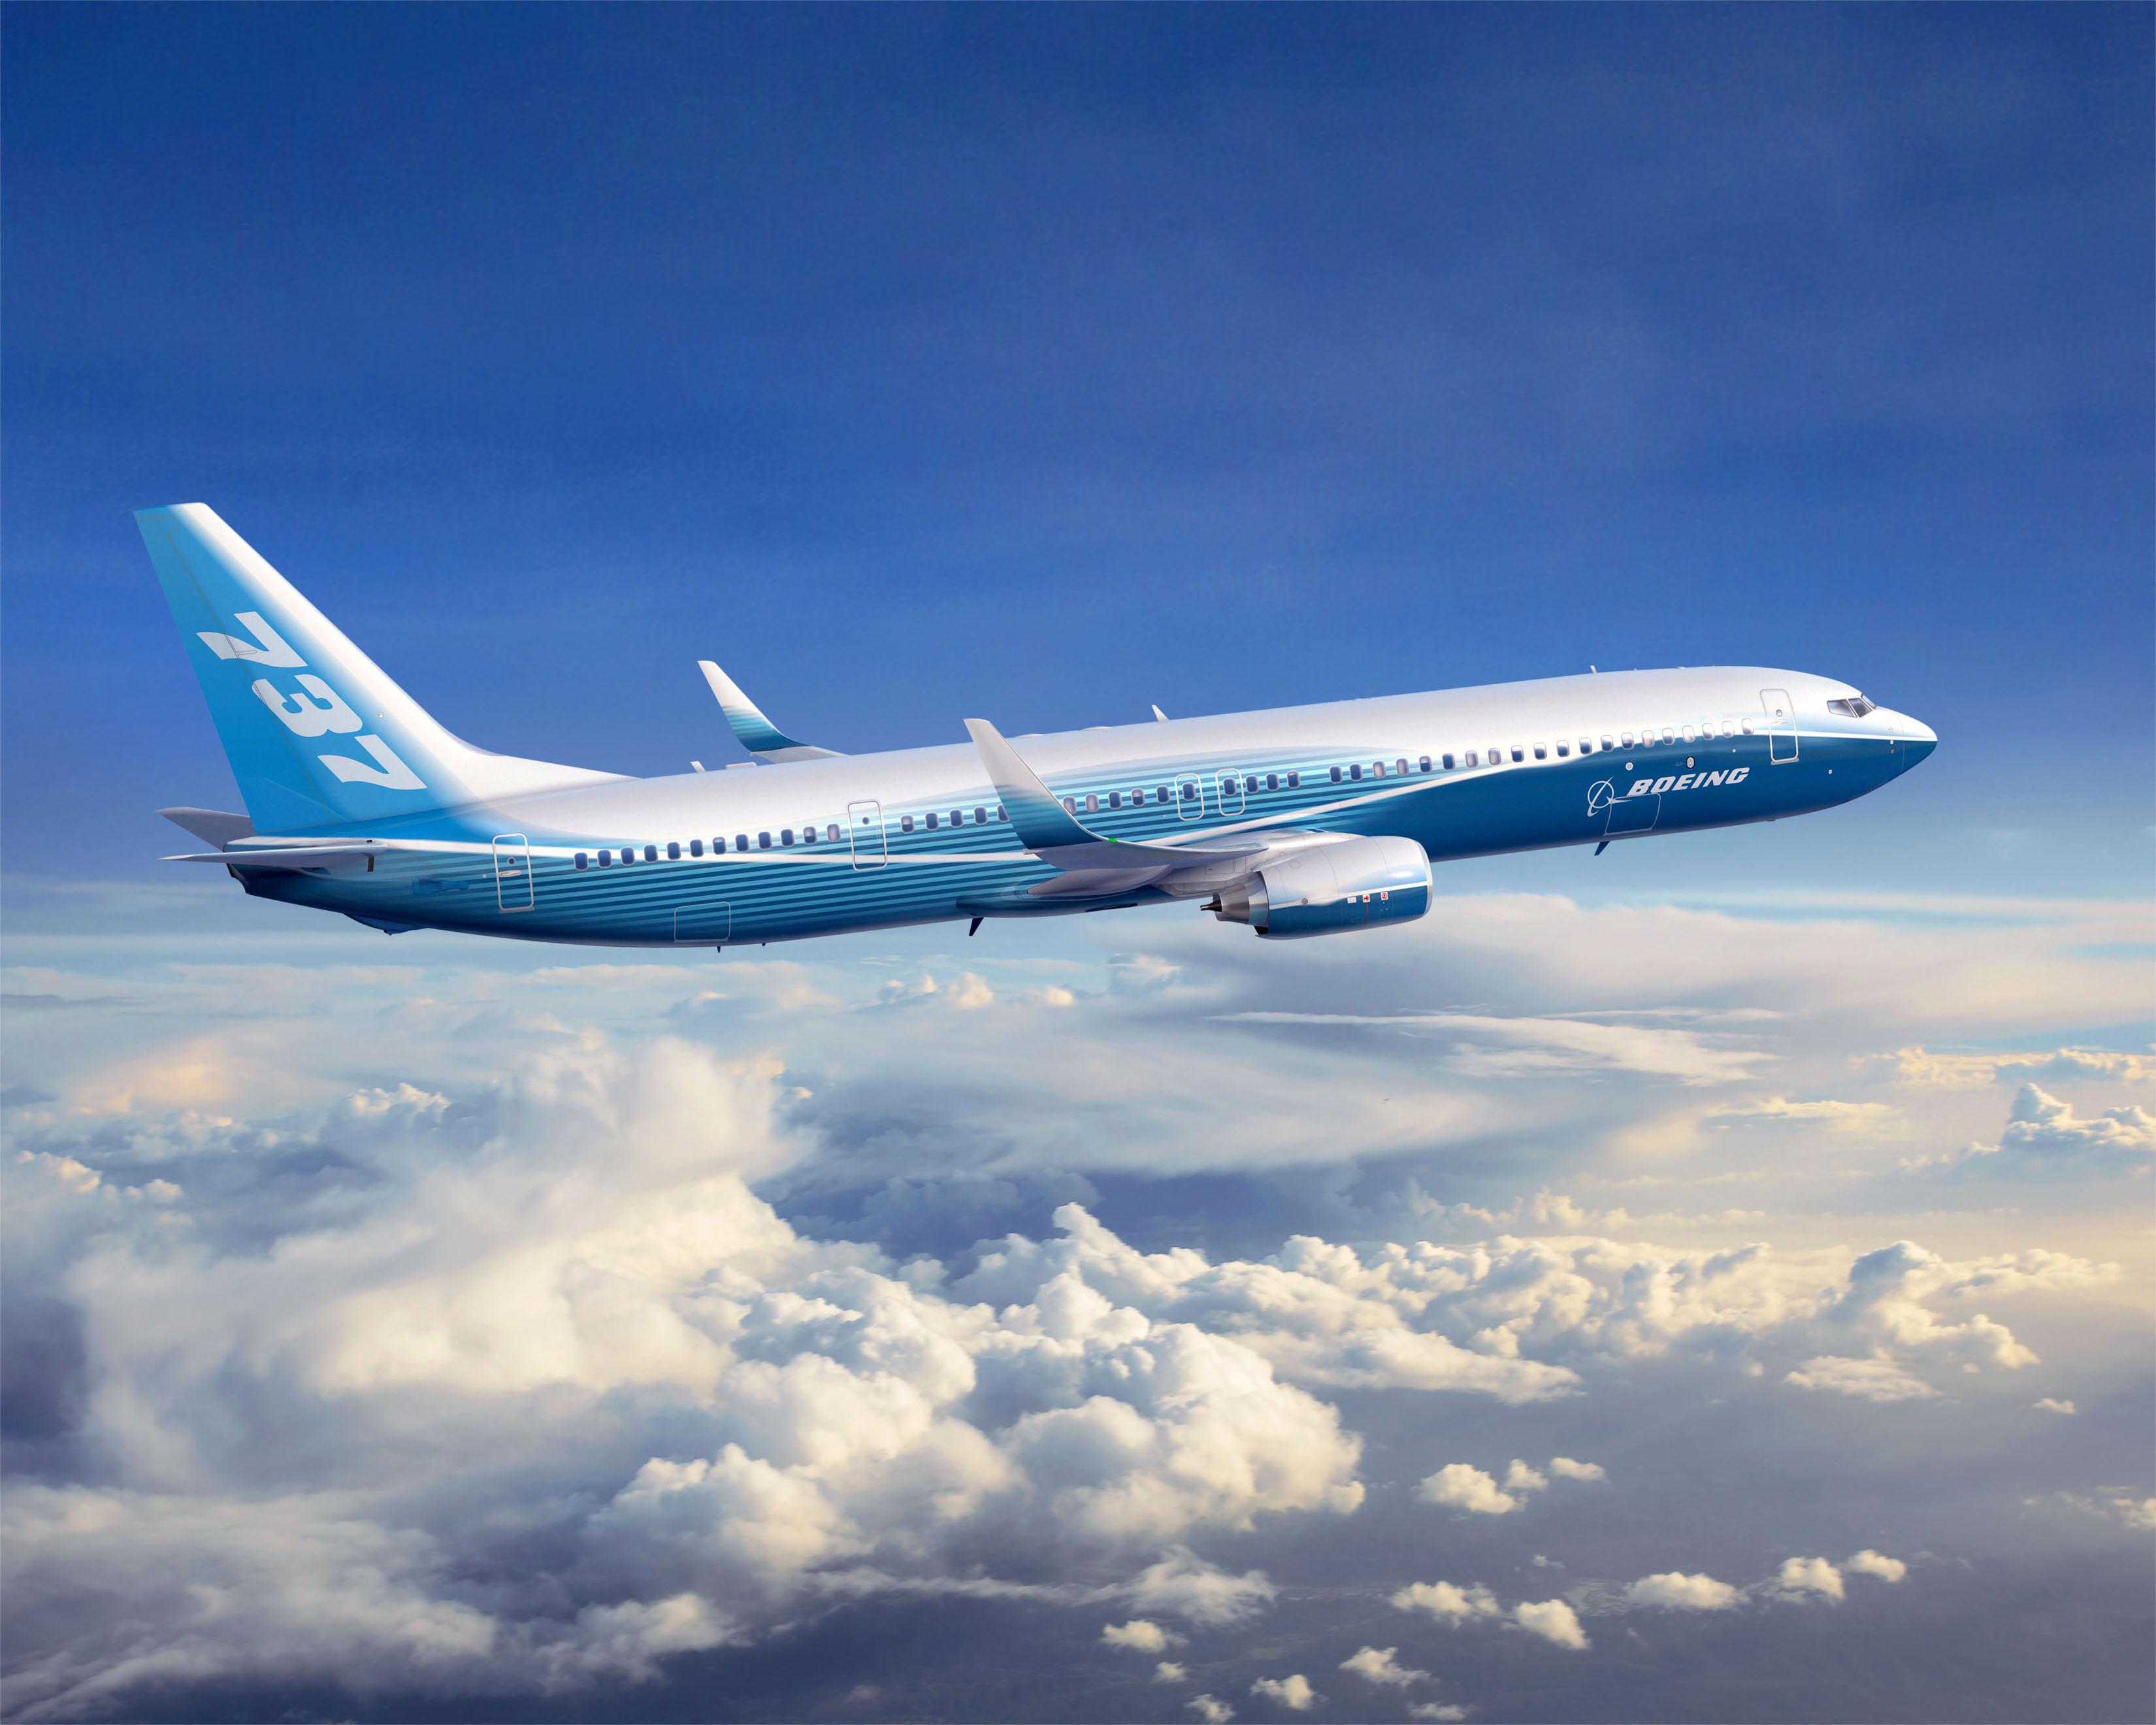 Boeing Next Generation 737 900er Surpasses 500 Orders